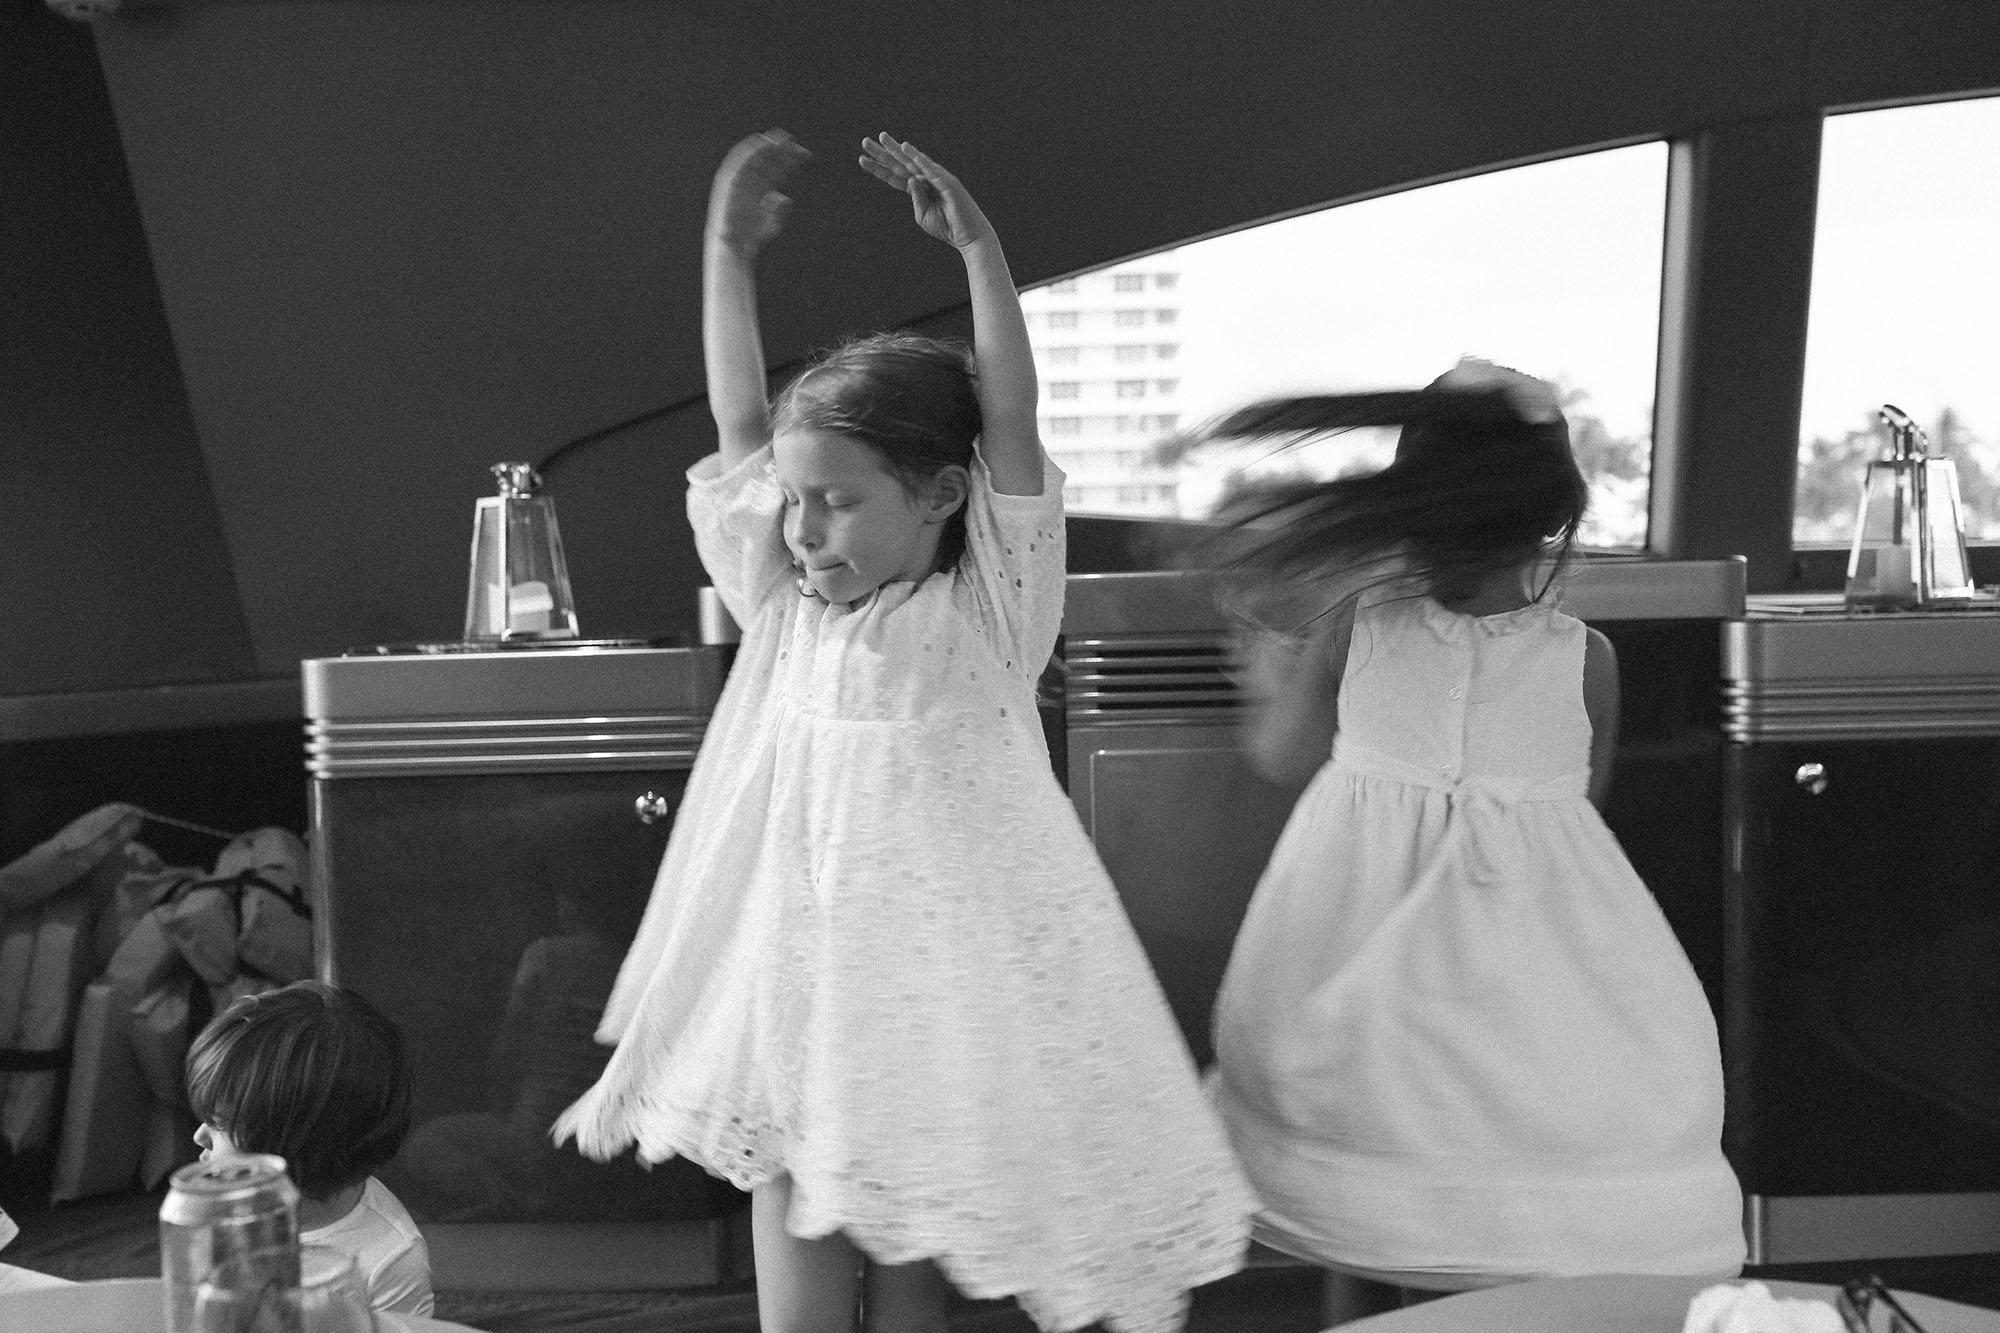 nhl_all_star_break_miami_toddlers_bw26.jpg